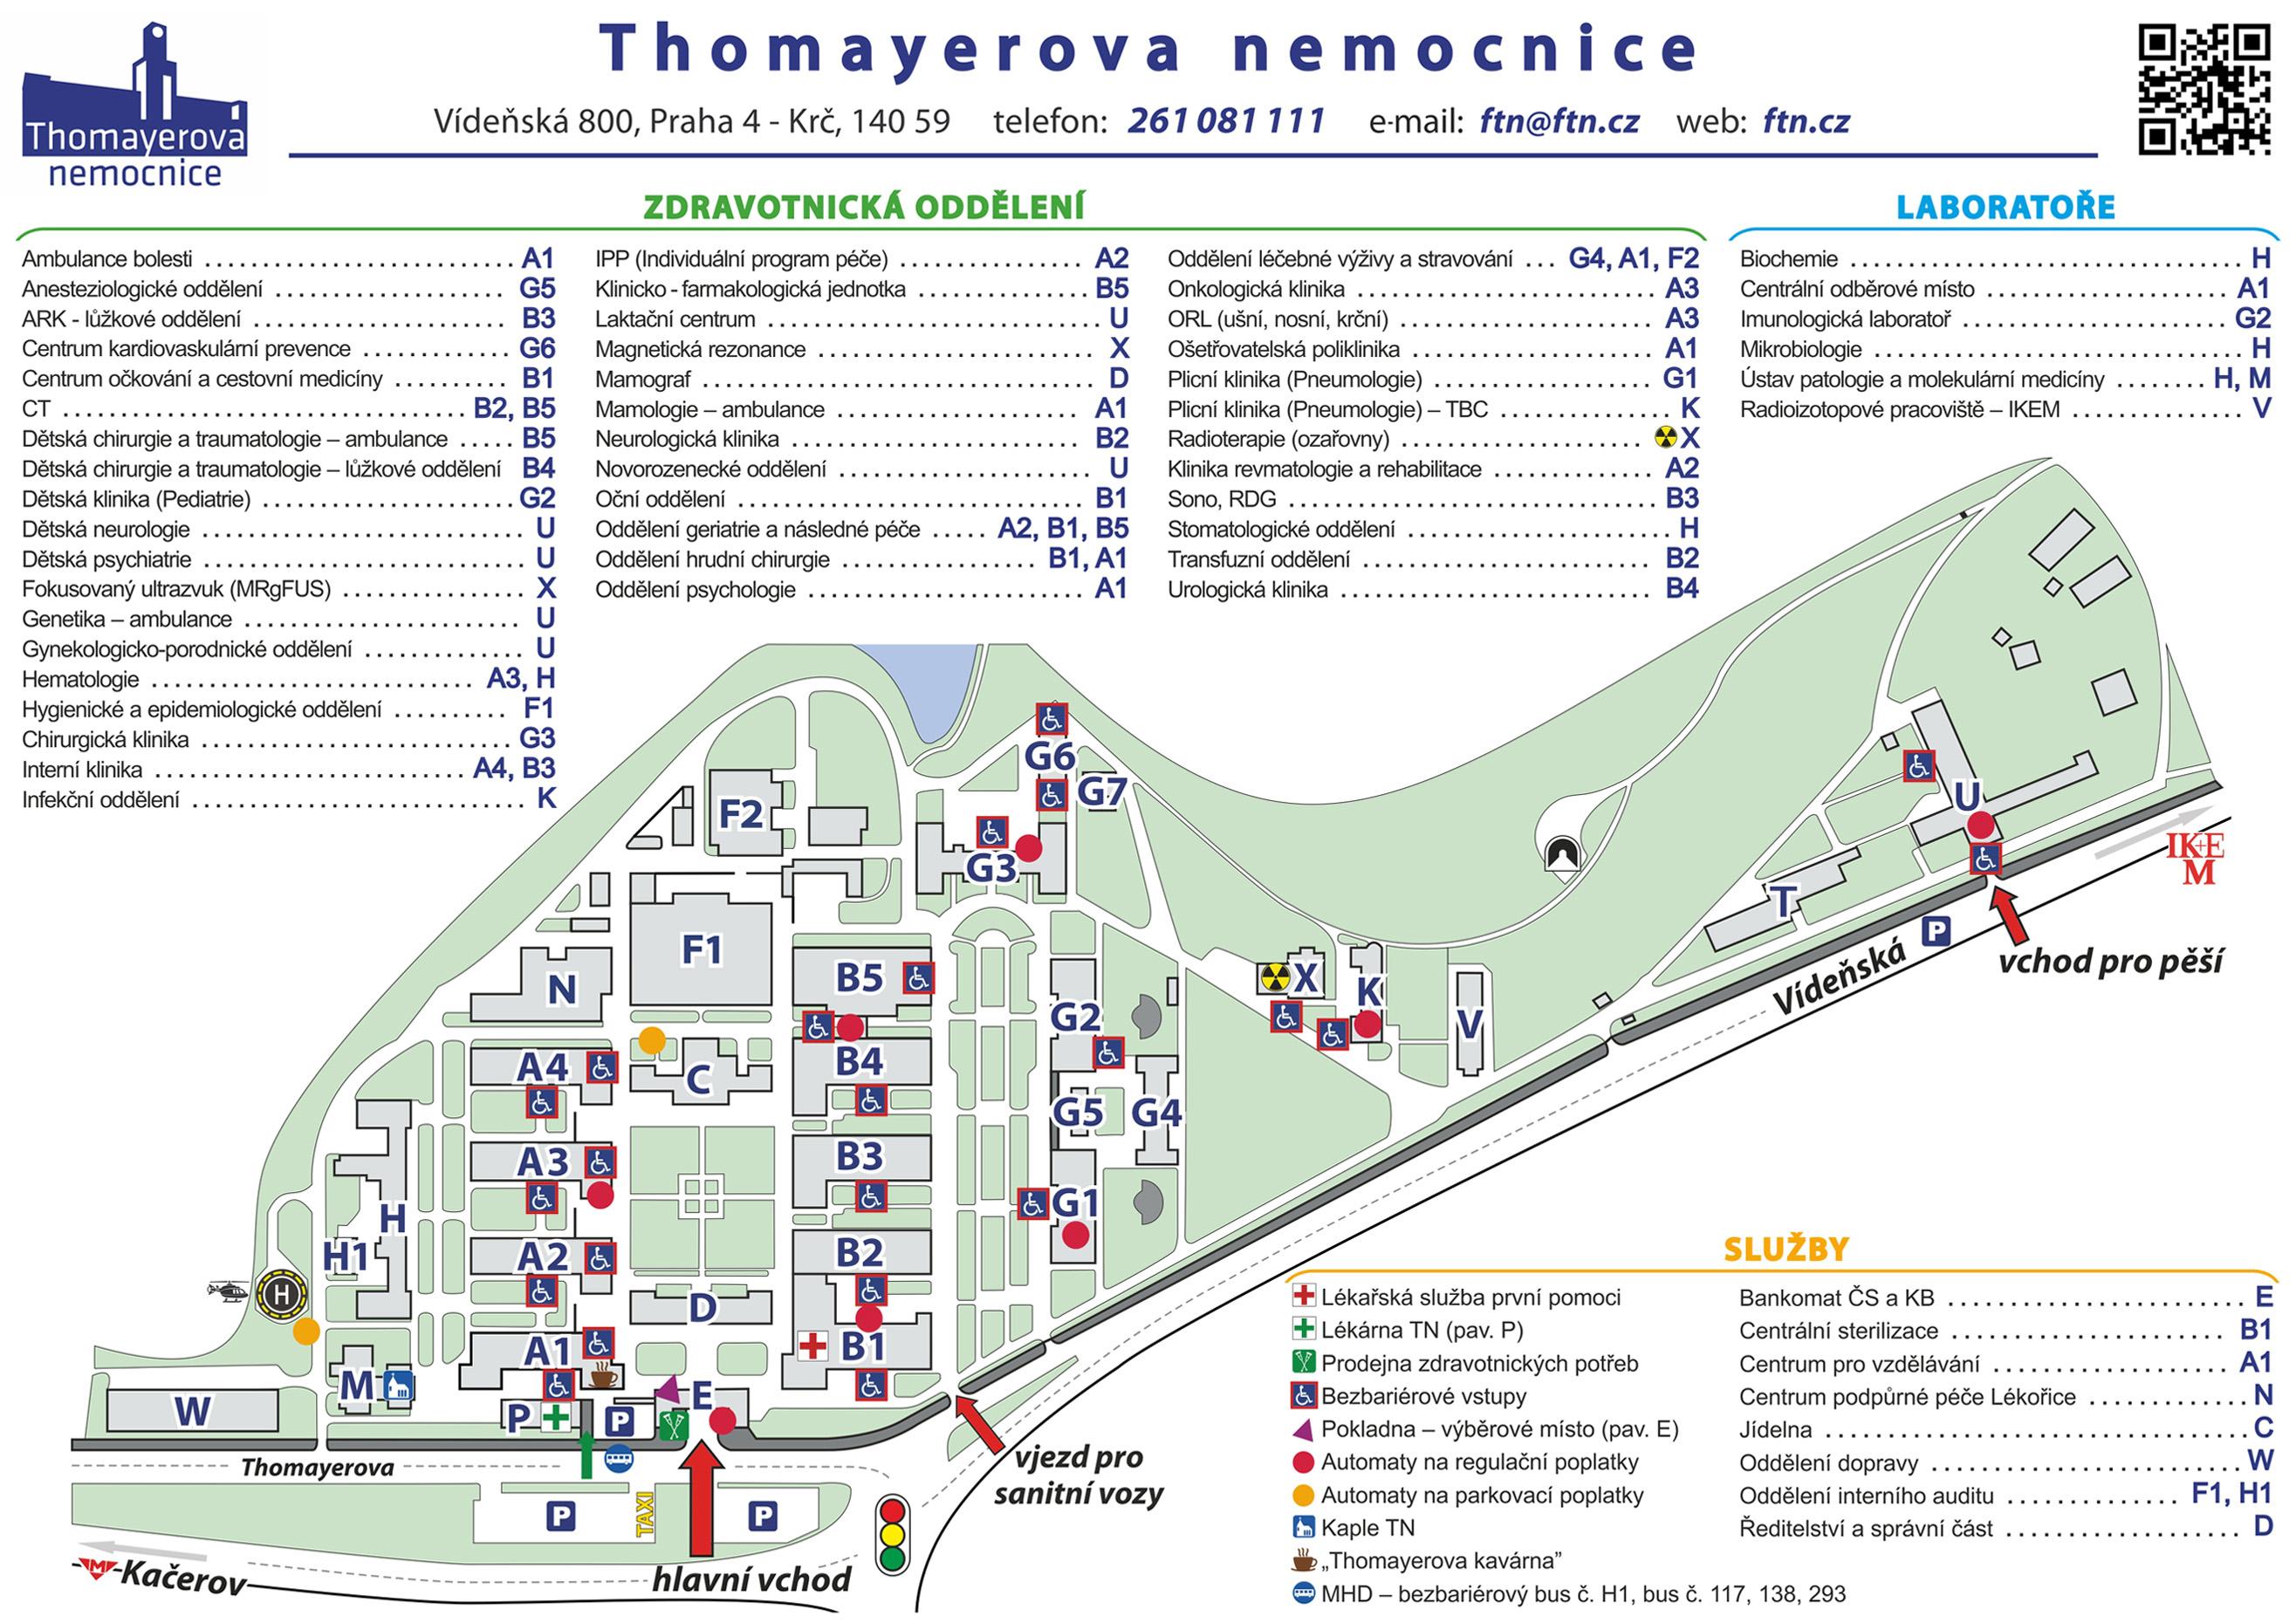 Obrázek na adrese http://www.ftn.cz/upload/ftn/O_nemocnici/Fotky/TN_mapa.jpg